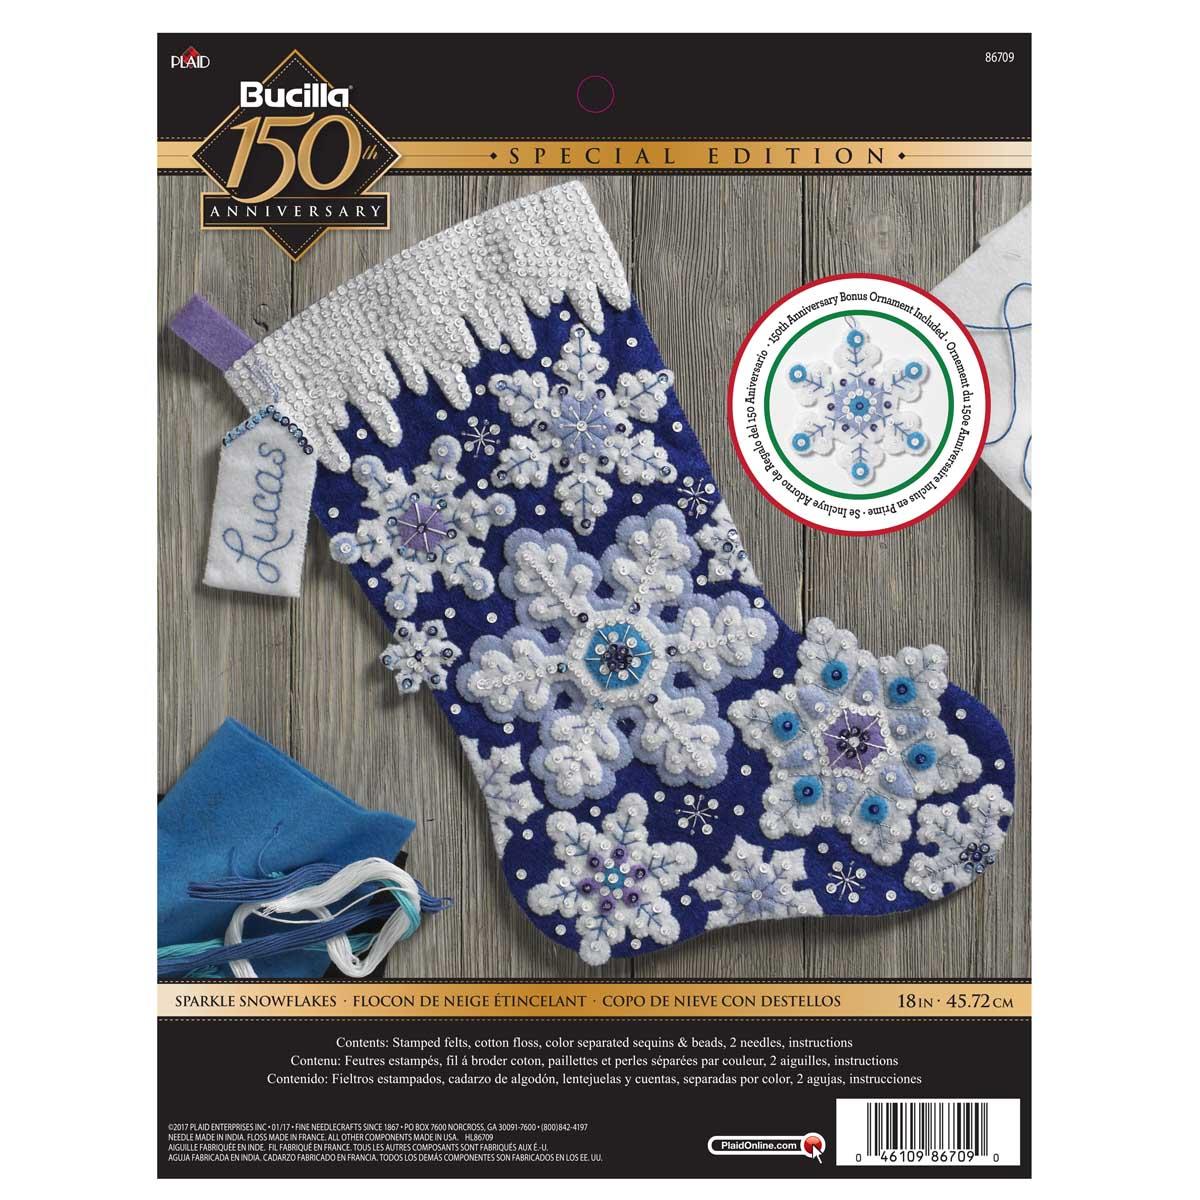 Bucilla ® Seasonal - Felt - Stocking Kits - Sparkle Snowflakes - 86709